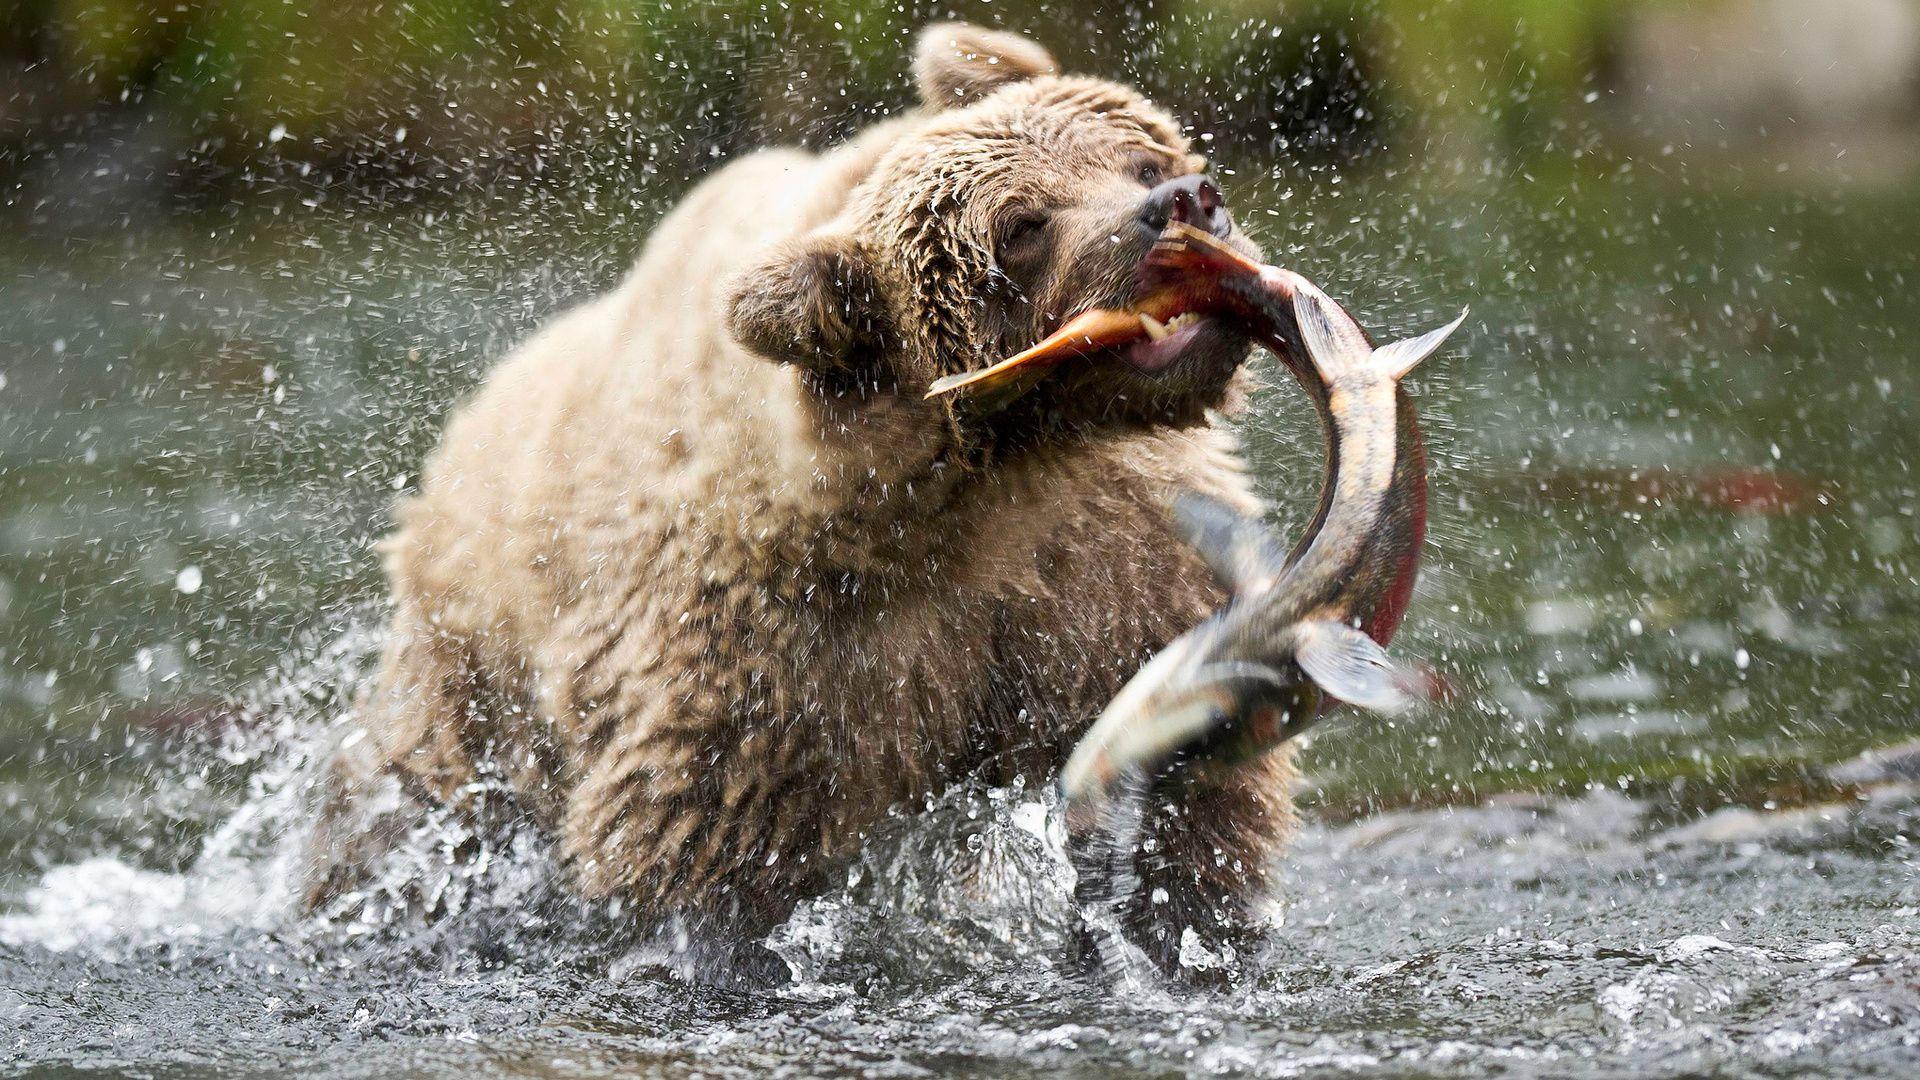 Pictures Bear, Fish, Splash Wallpaper, Picture